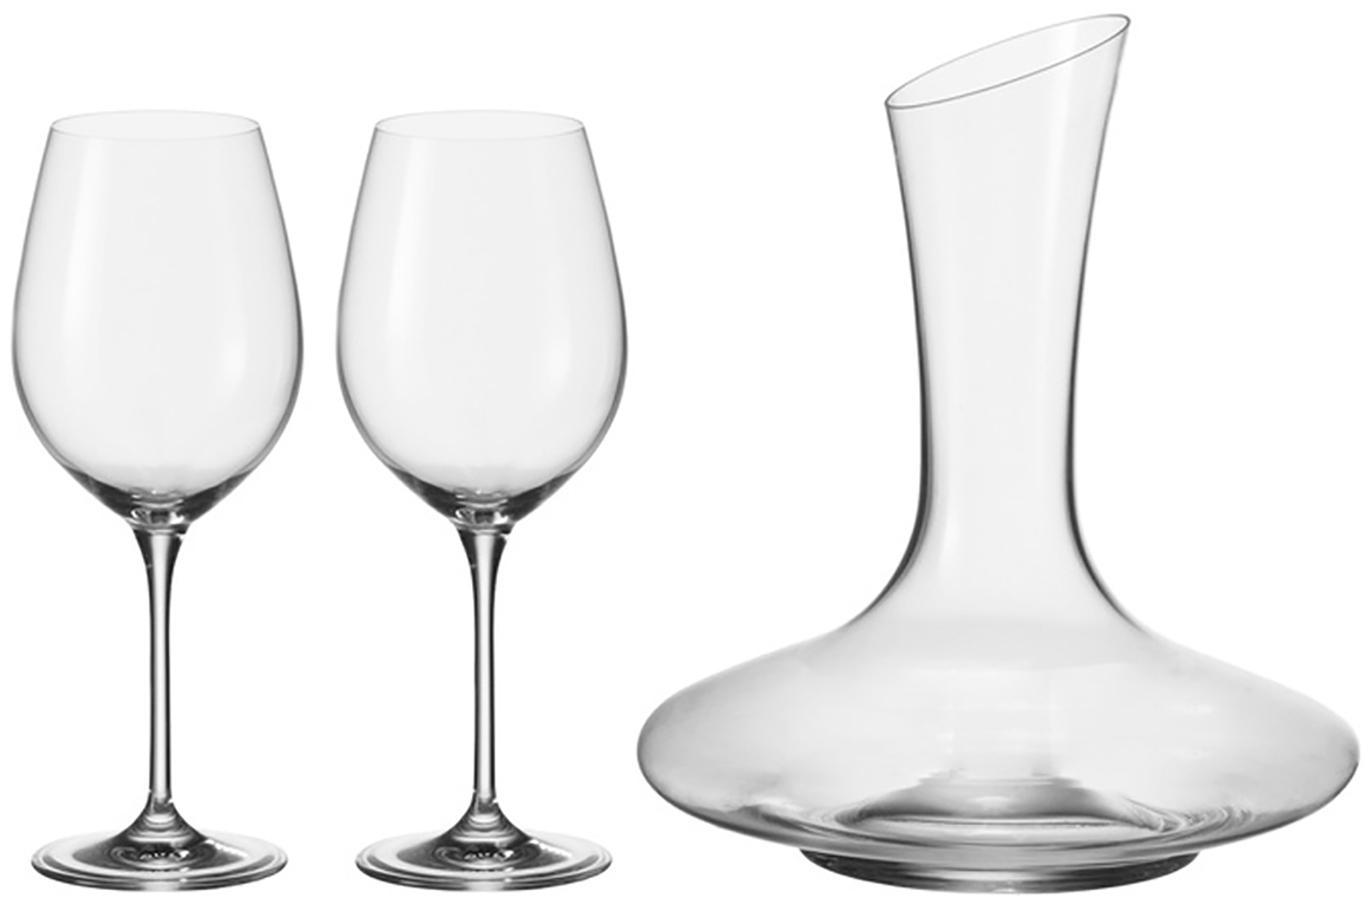 Set de vino tinto Barcelona, 3pzas., Vidrio, Transparente, Set de diferentes tamaños